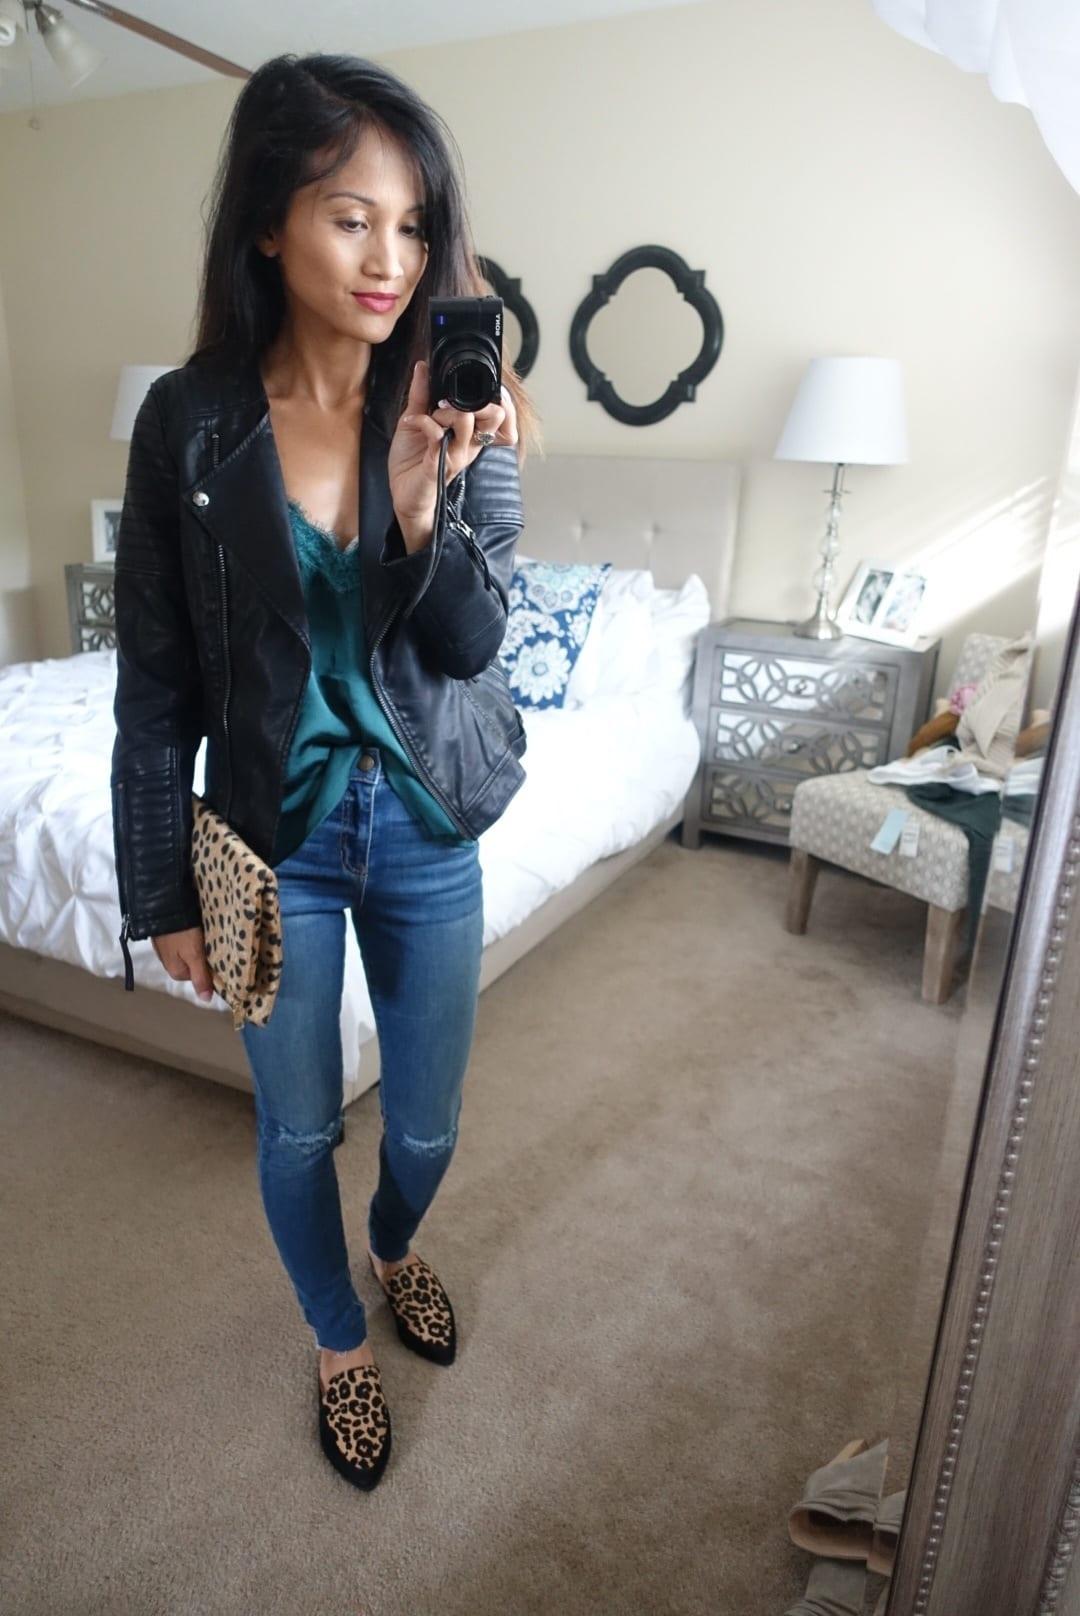 black Moto jacket, toyshop jacket, leopard mules, leopard clutch, nordstrom anniversary sale 2017